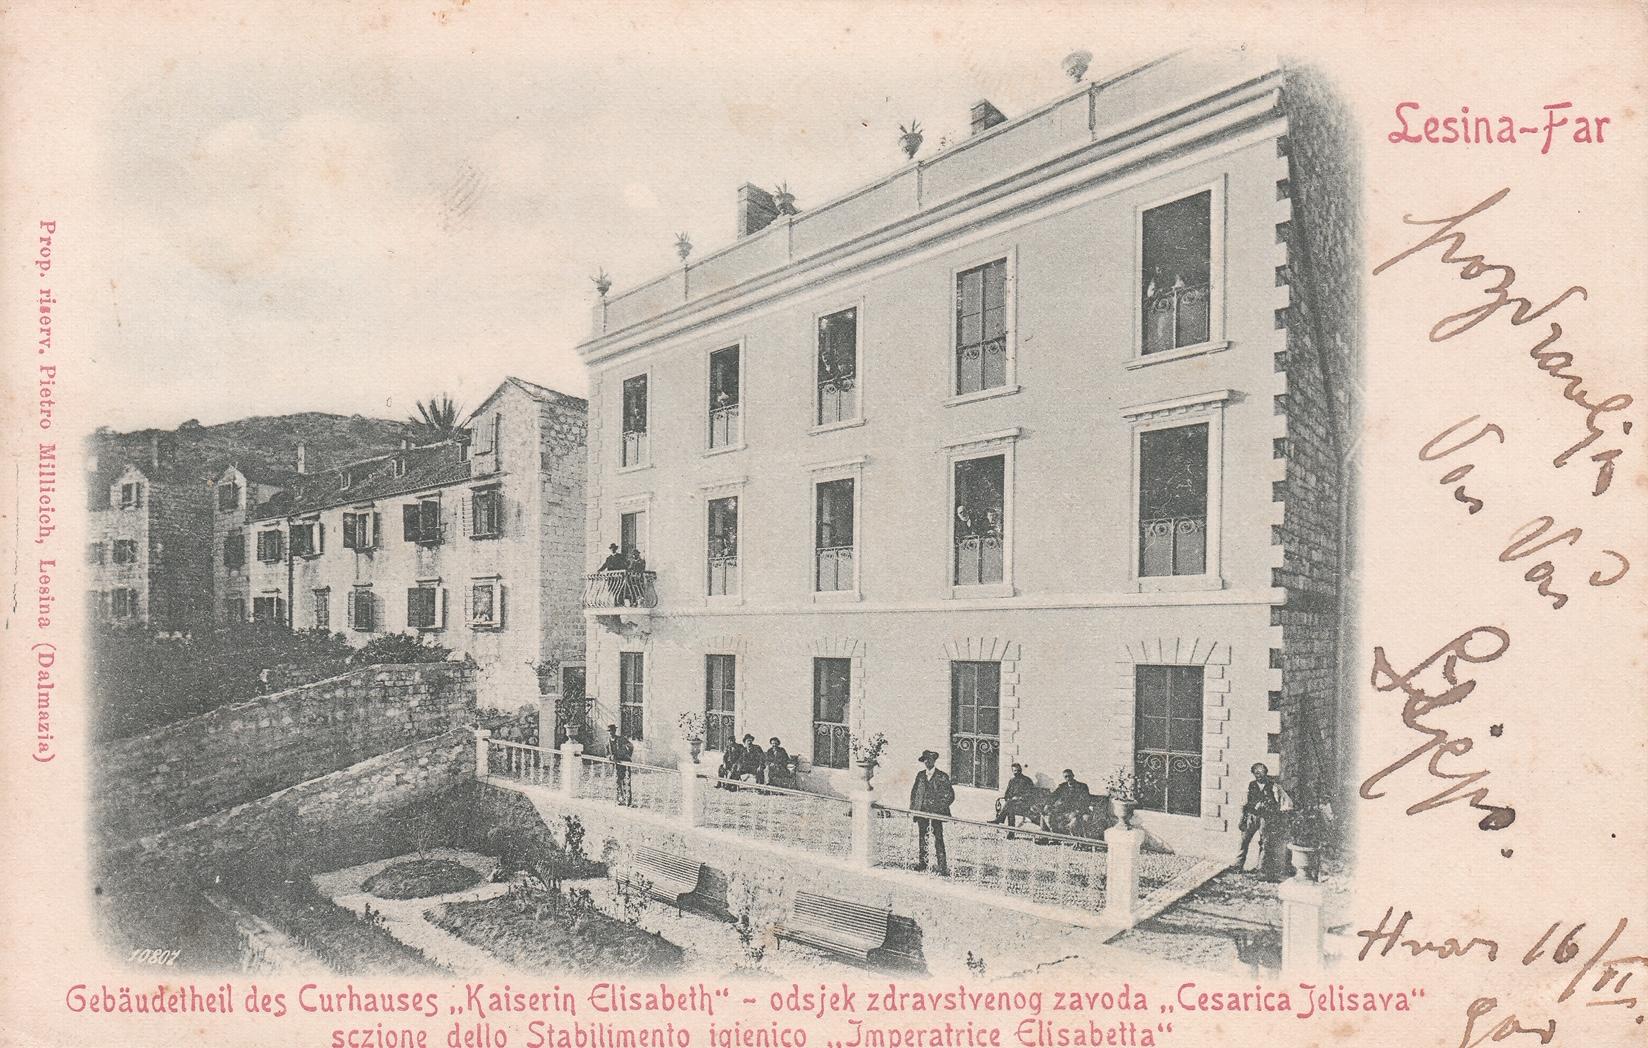 Empress Elizabet Hotel, Hvar, Croatia, photo credit by Siniša Matković-Mikulčić, Secret Hvar agency